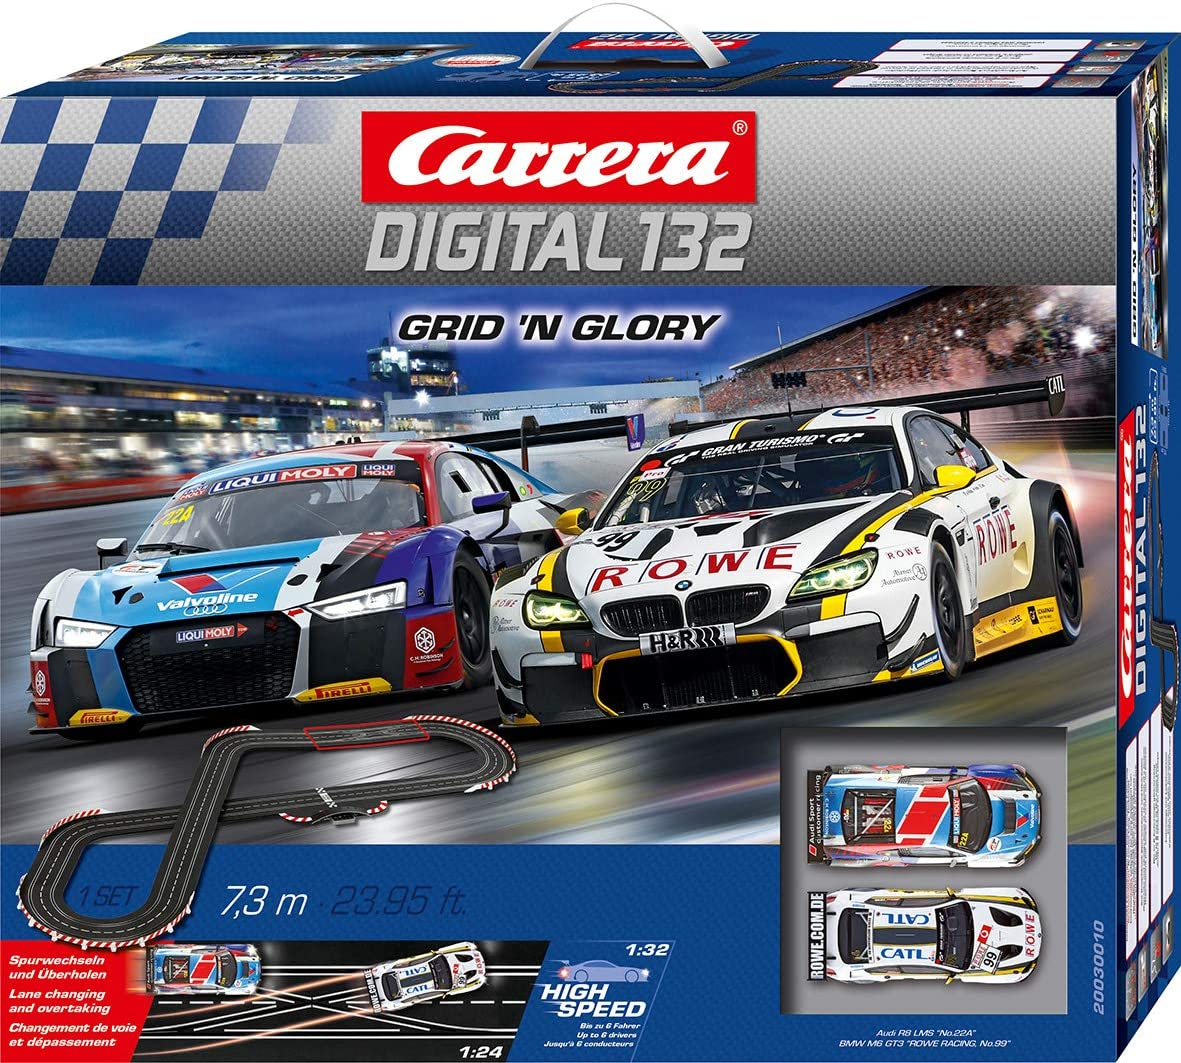 Carrera Digital 132 Grid N Glory 20030010 Racing Track Set Spielzeug